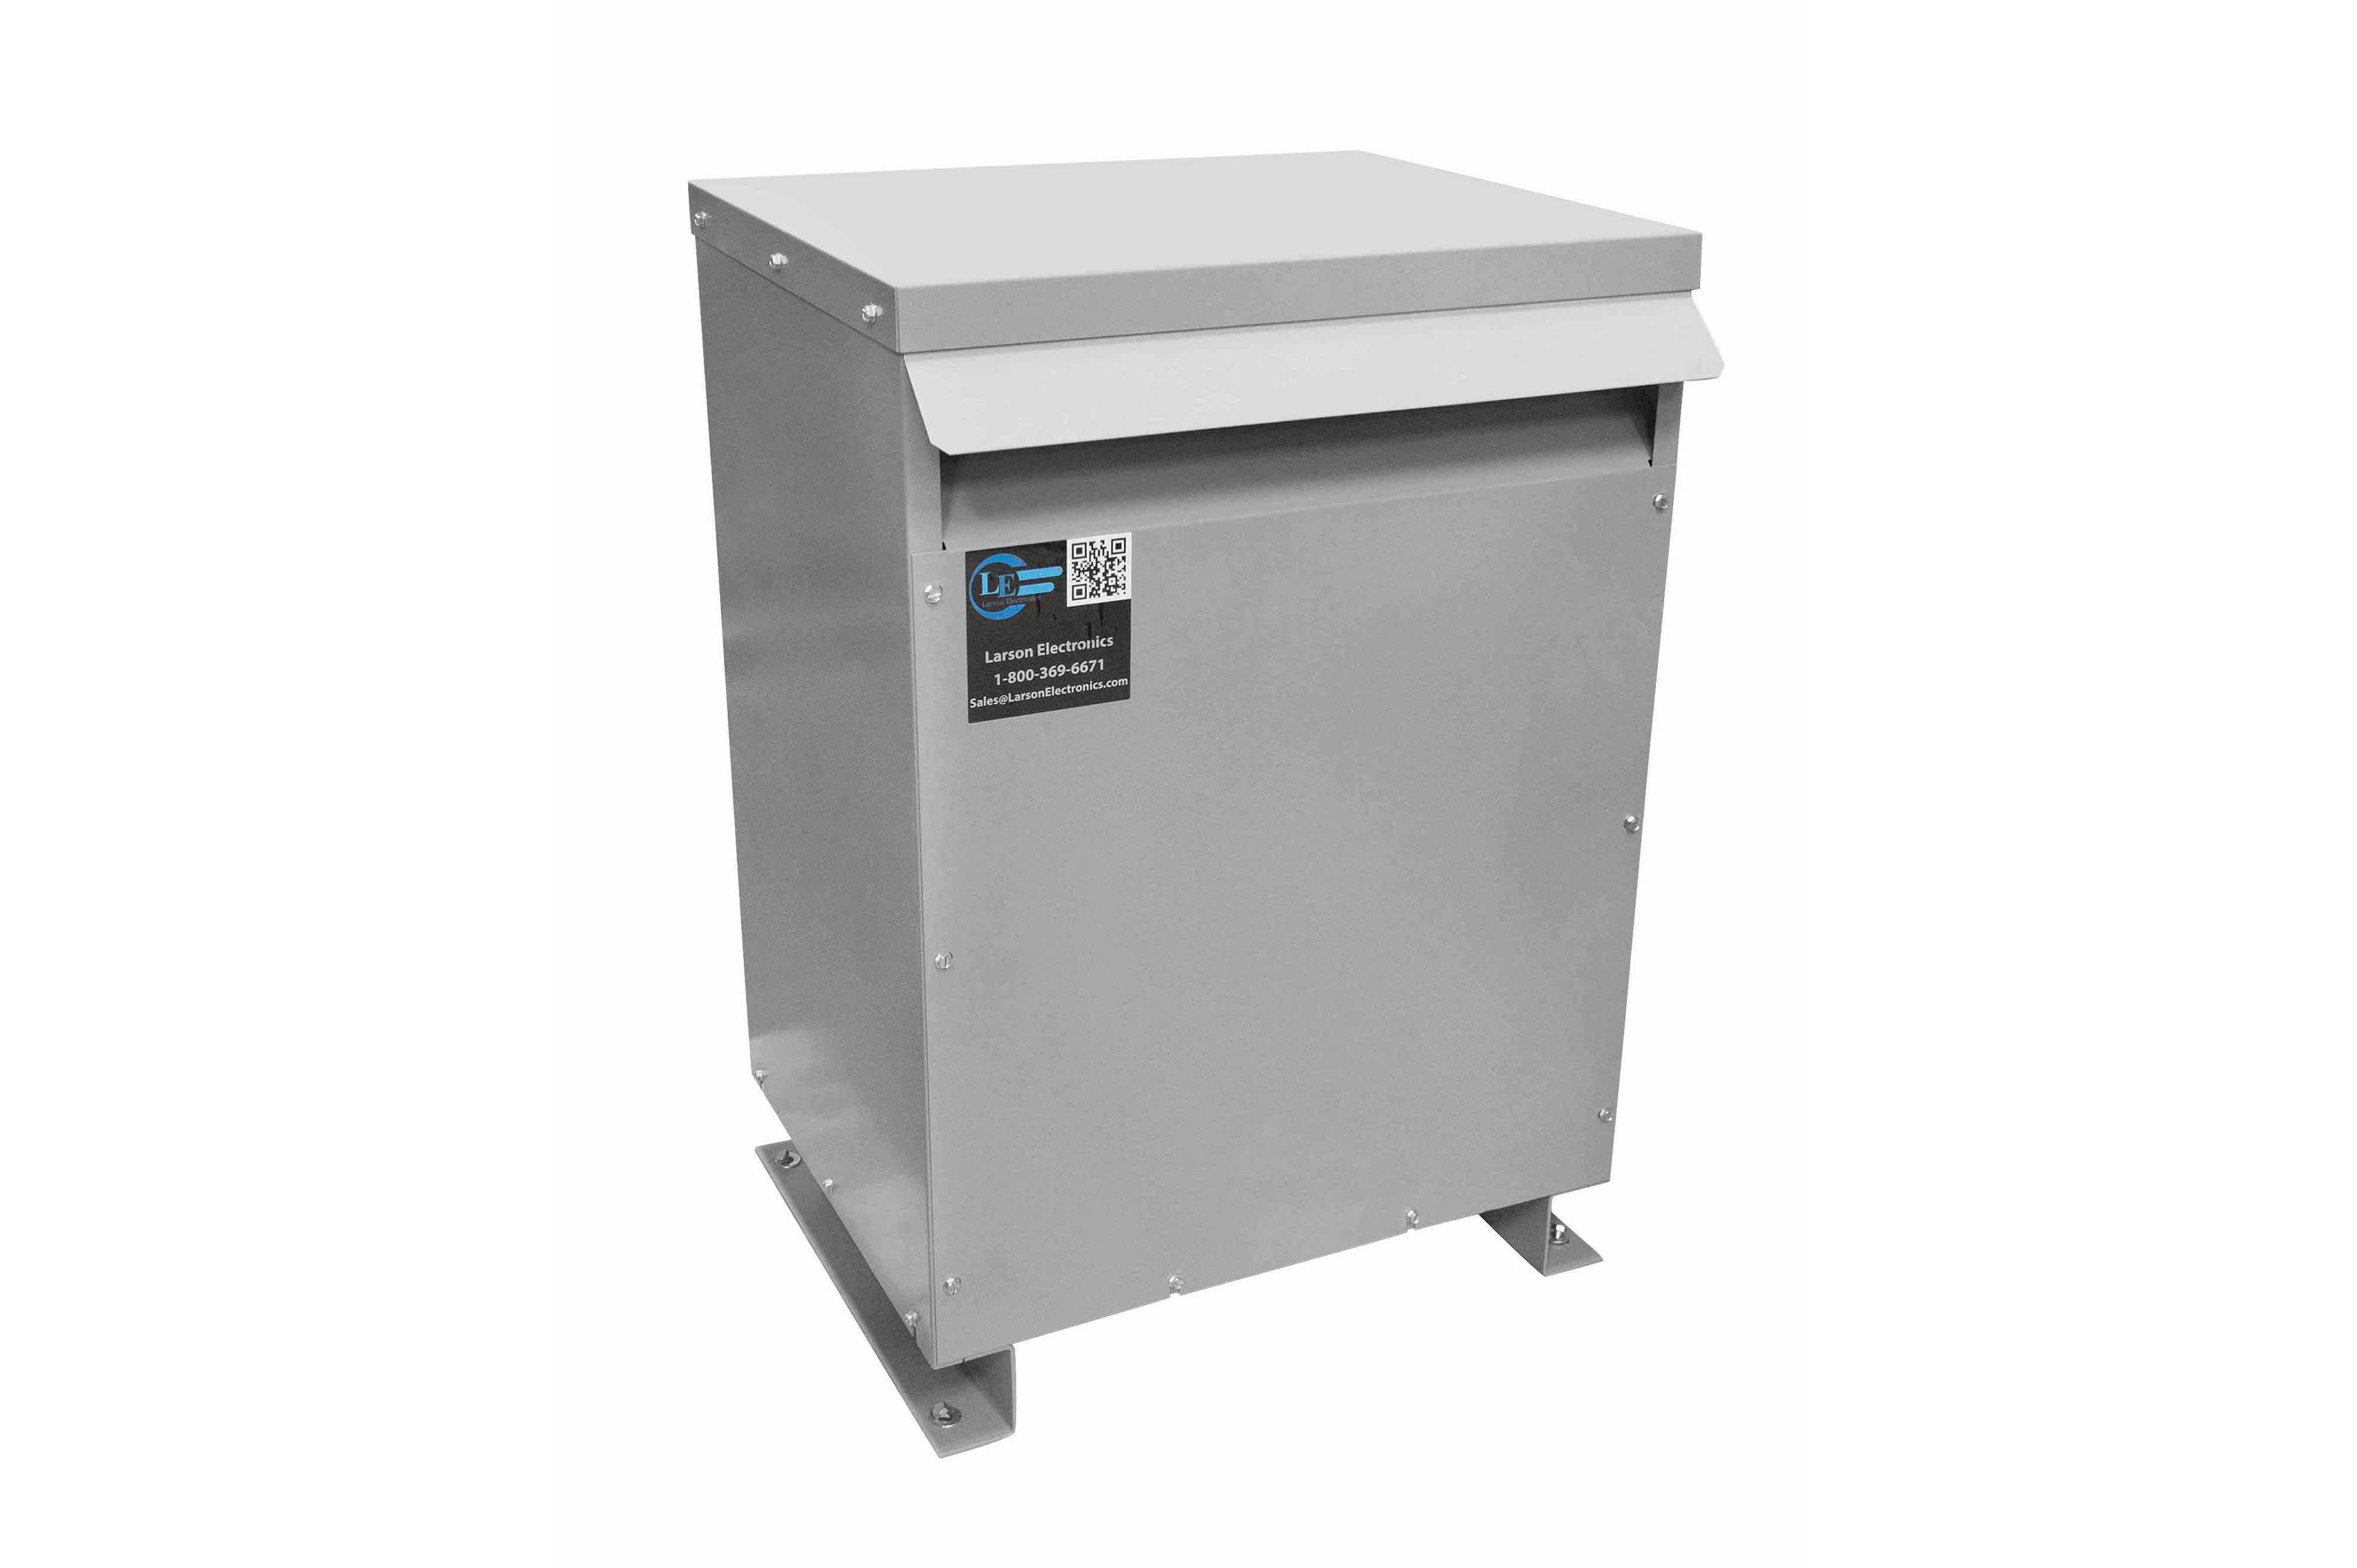 100 kVA 3PH Isolation Transformer, 600V Wye Primary, 380V Delta Secondary, N3R, Ventilated, 60 Hz